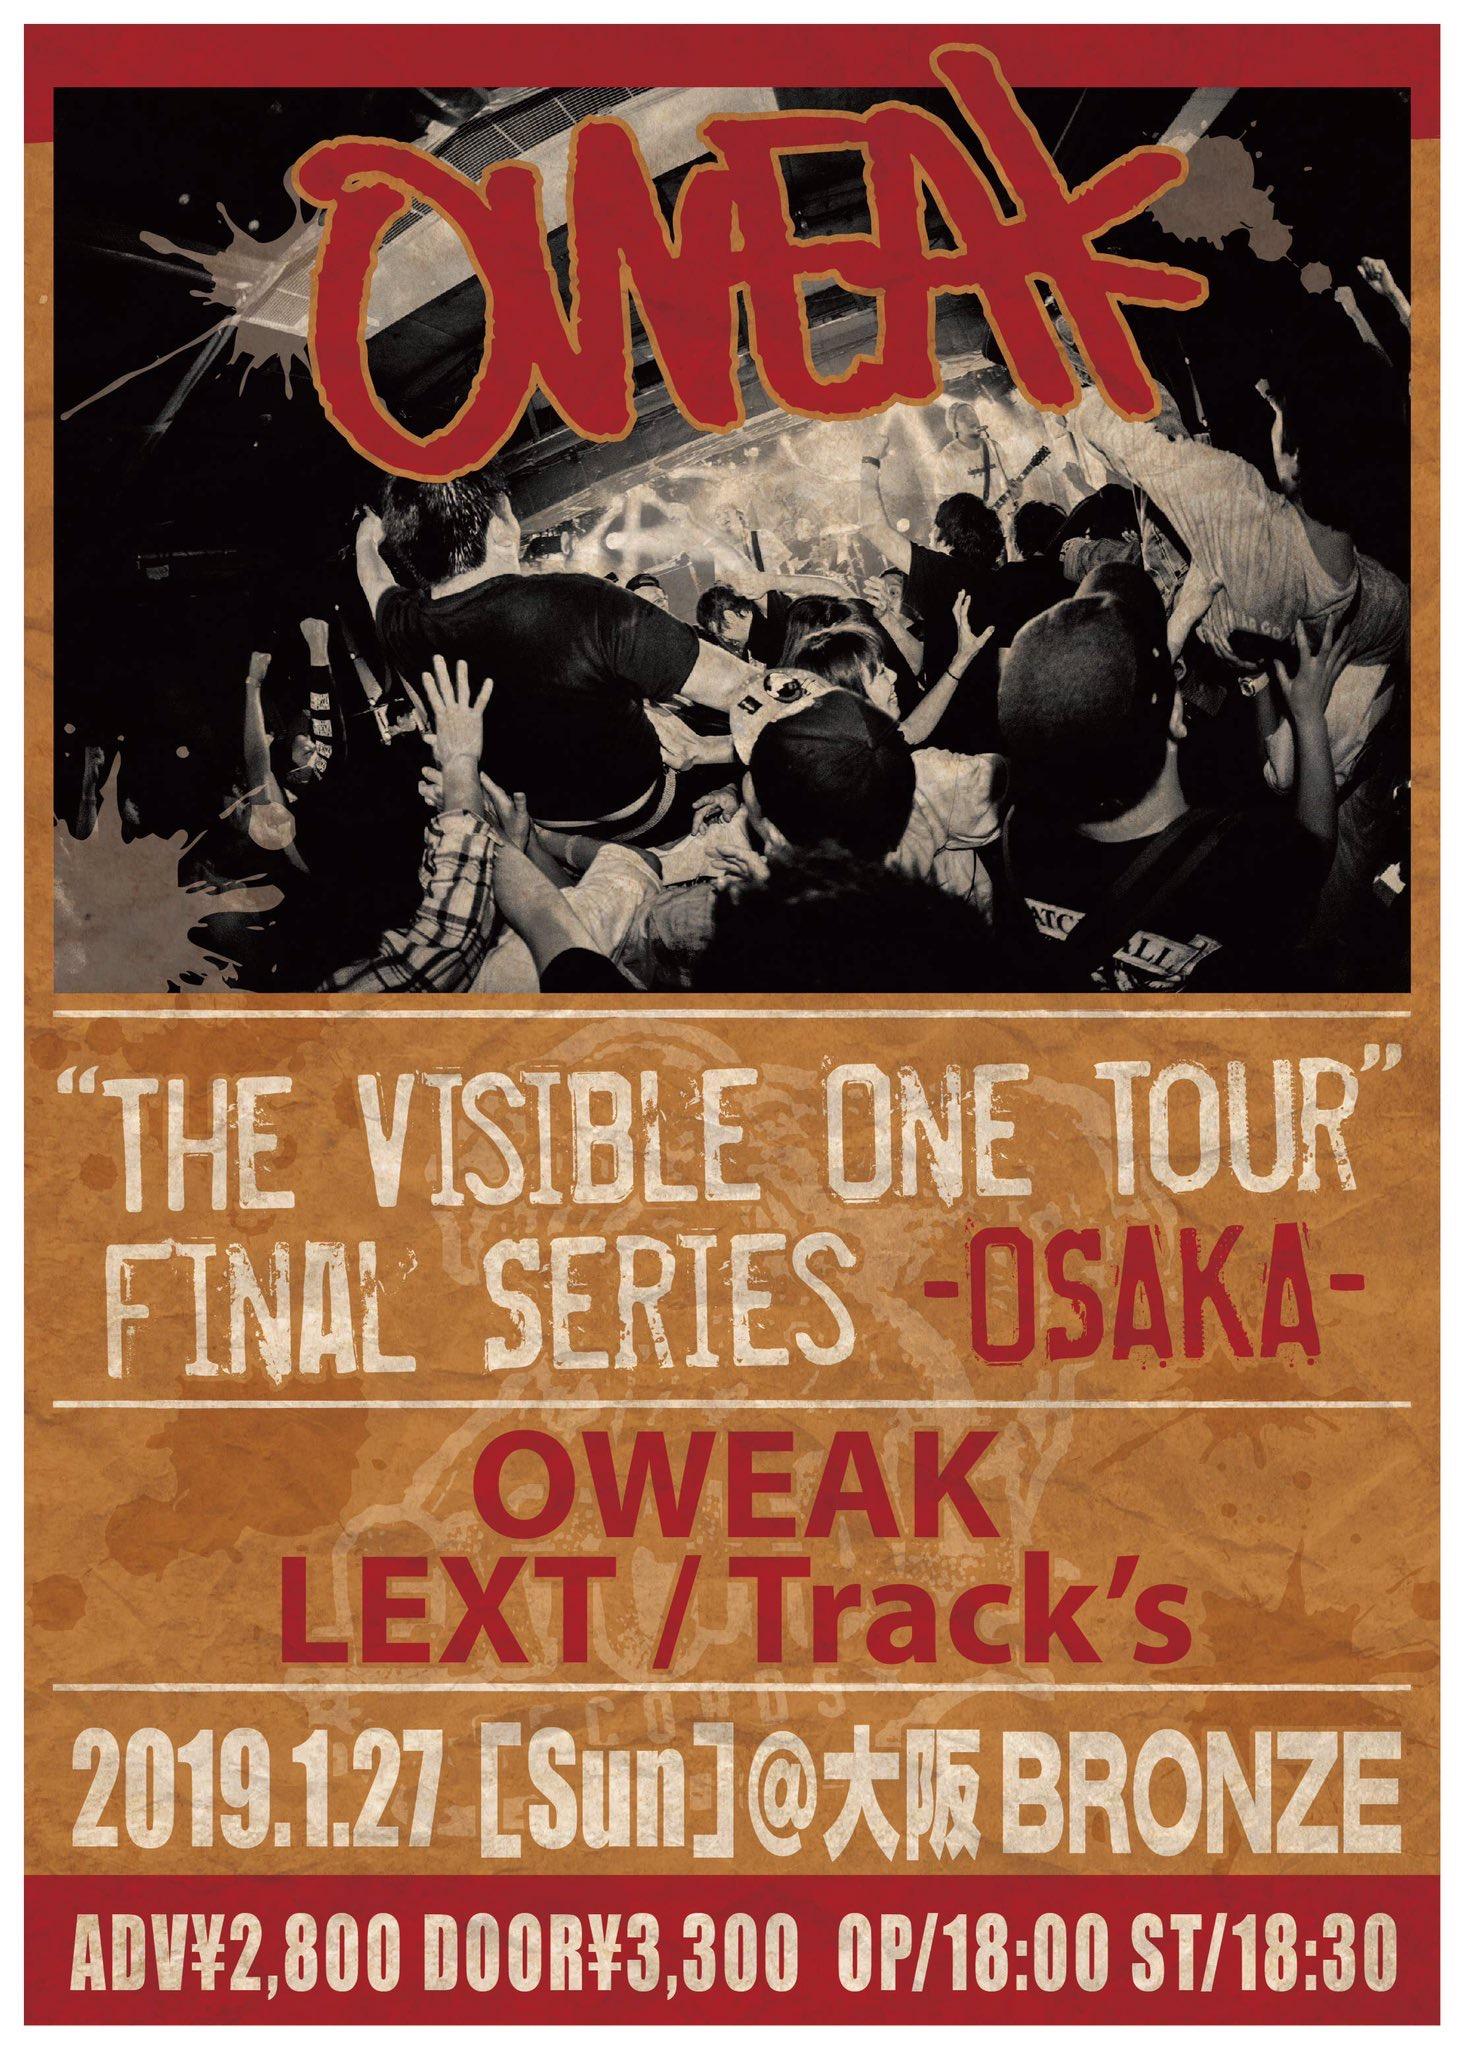 oweak_lext_track's